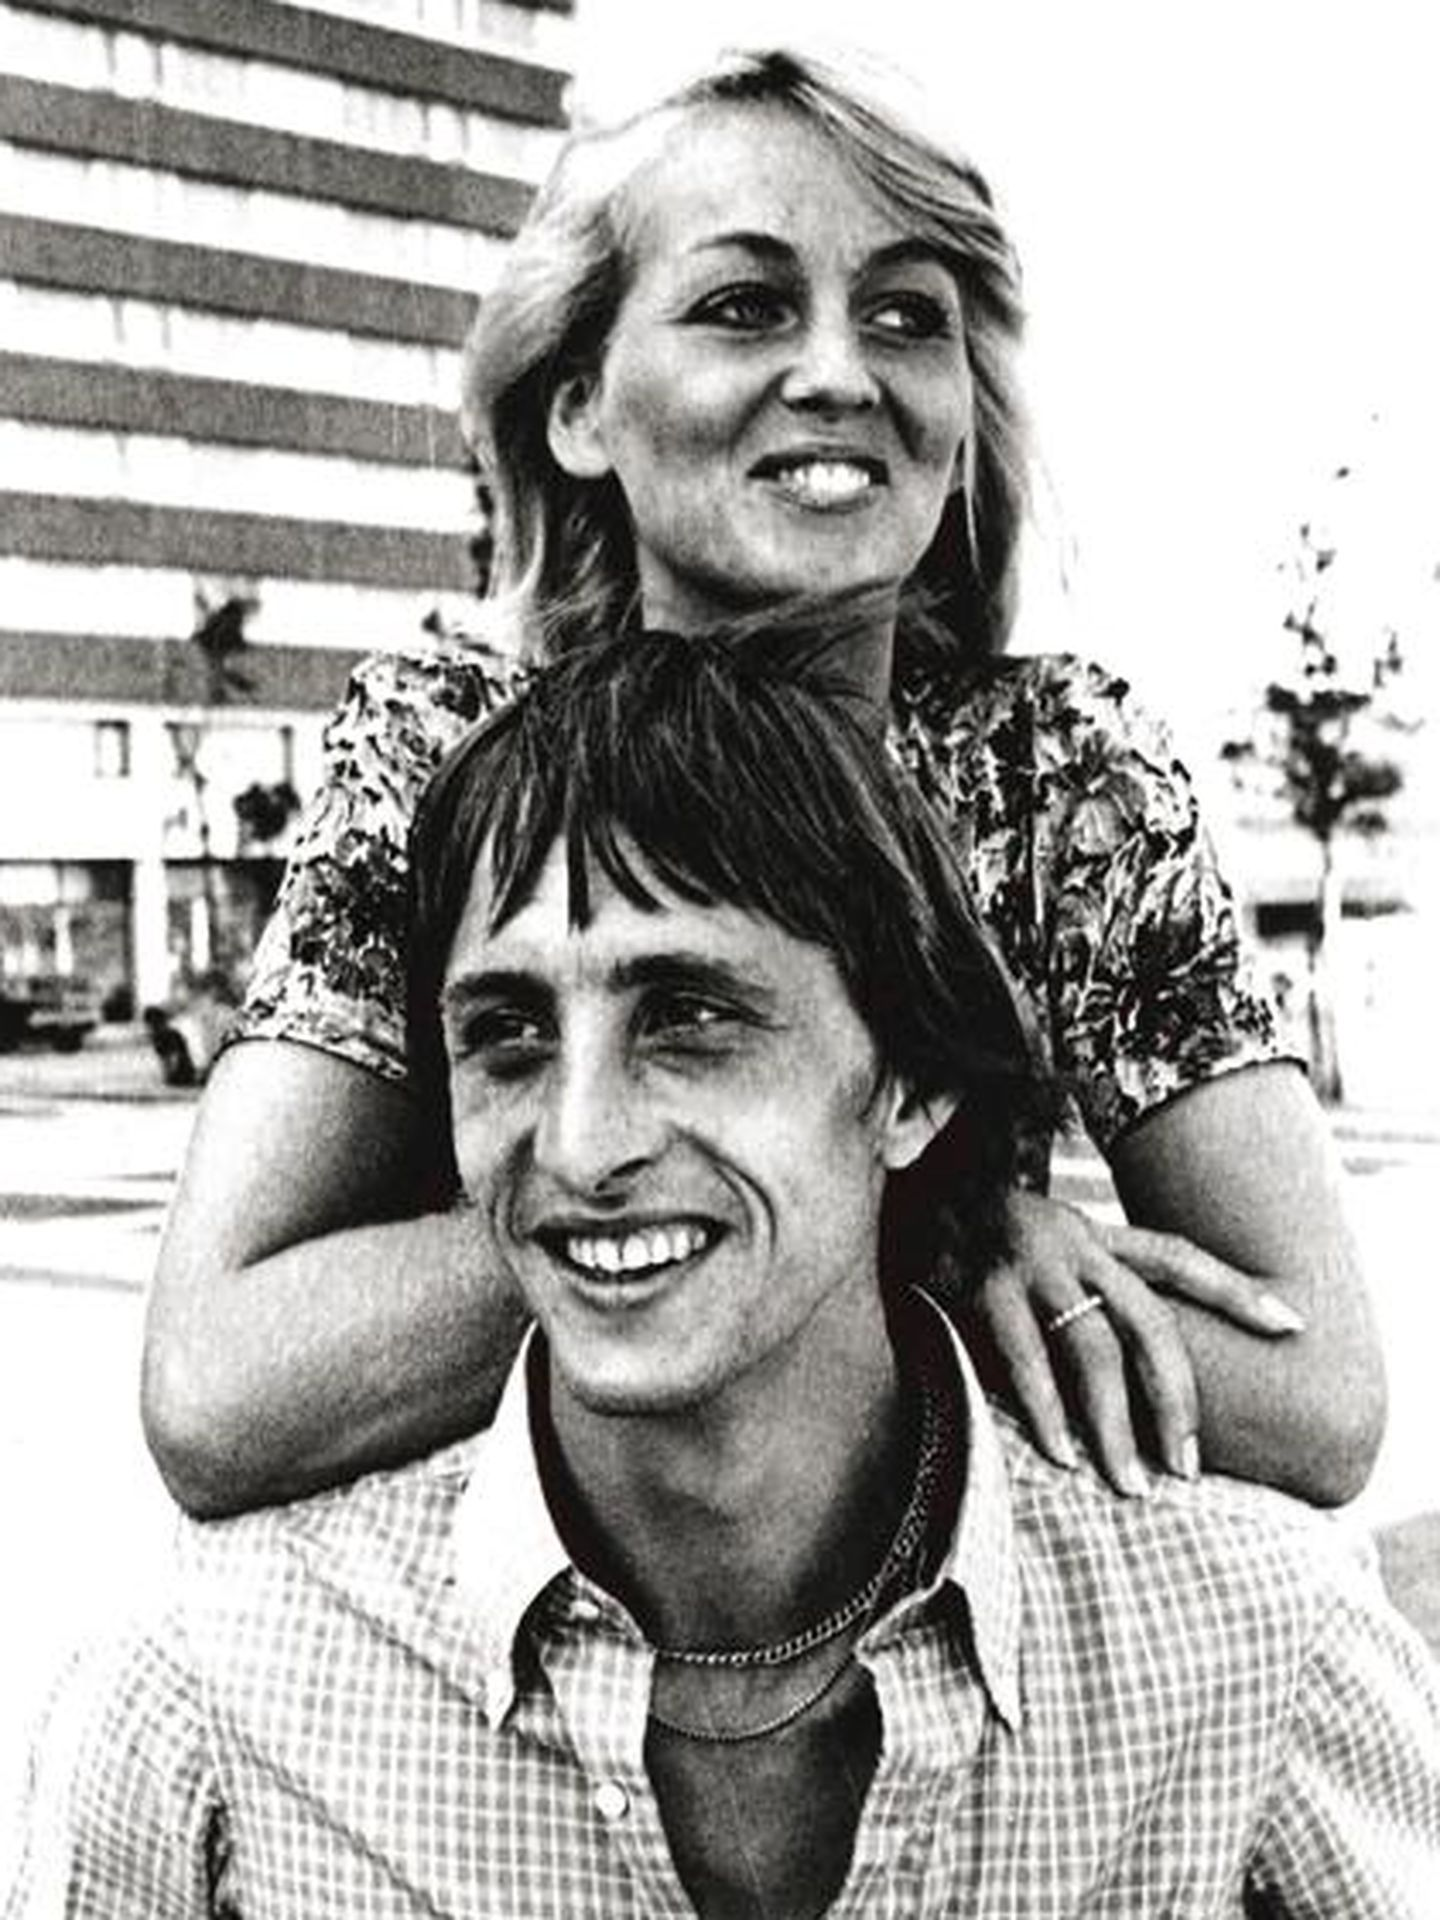 Johan Cruyff junto a su mujer, Daniela 'Danny' Coster. (Facebook)